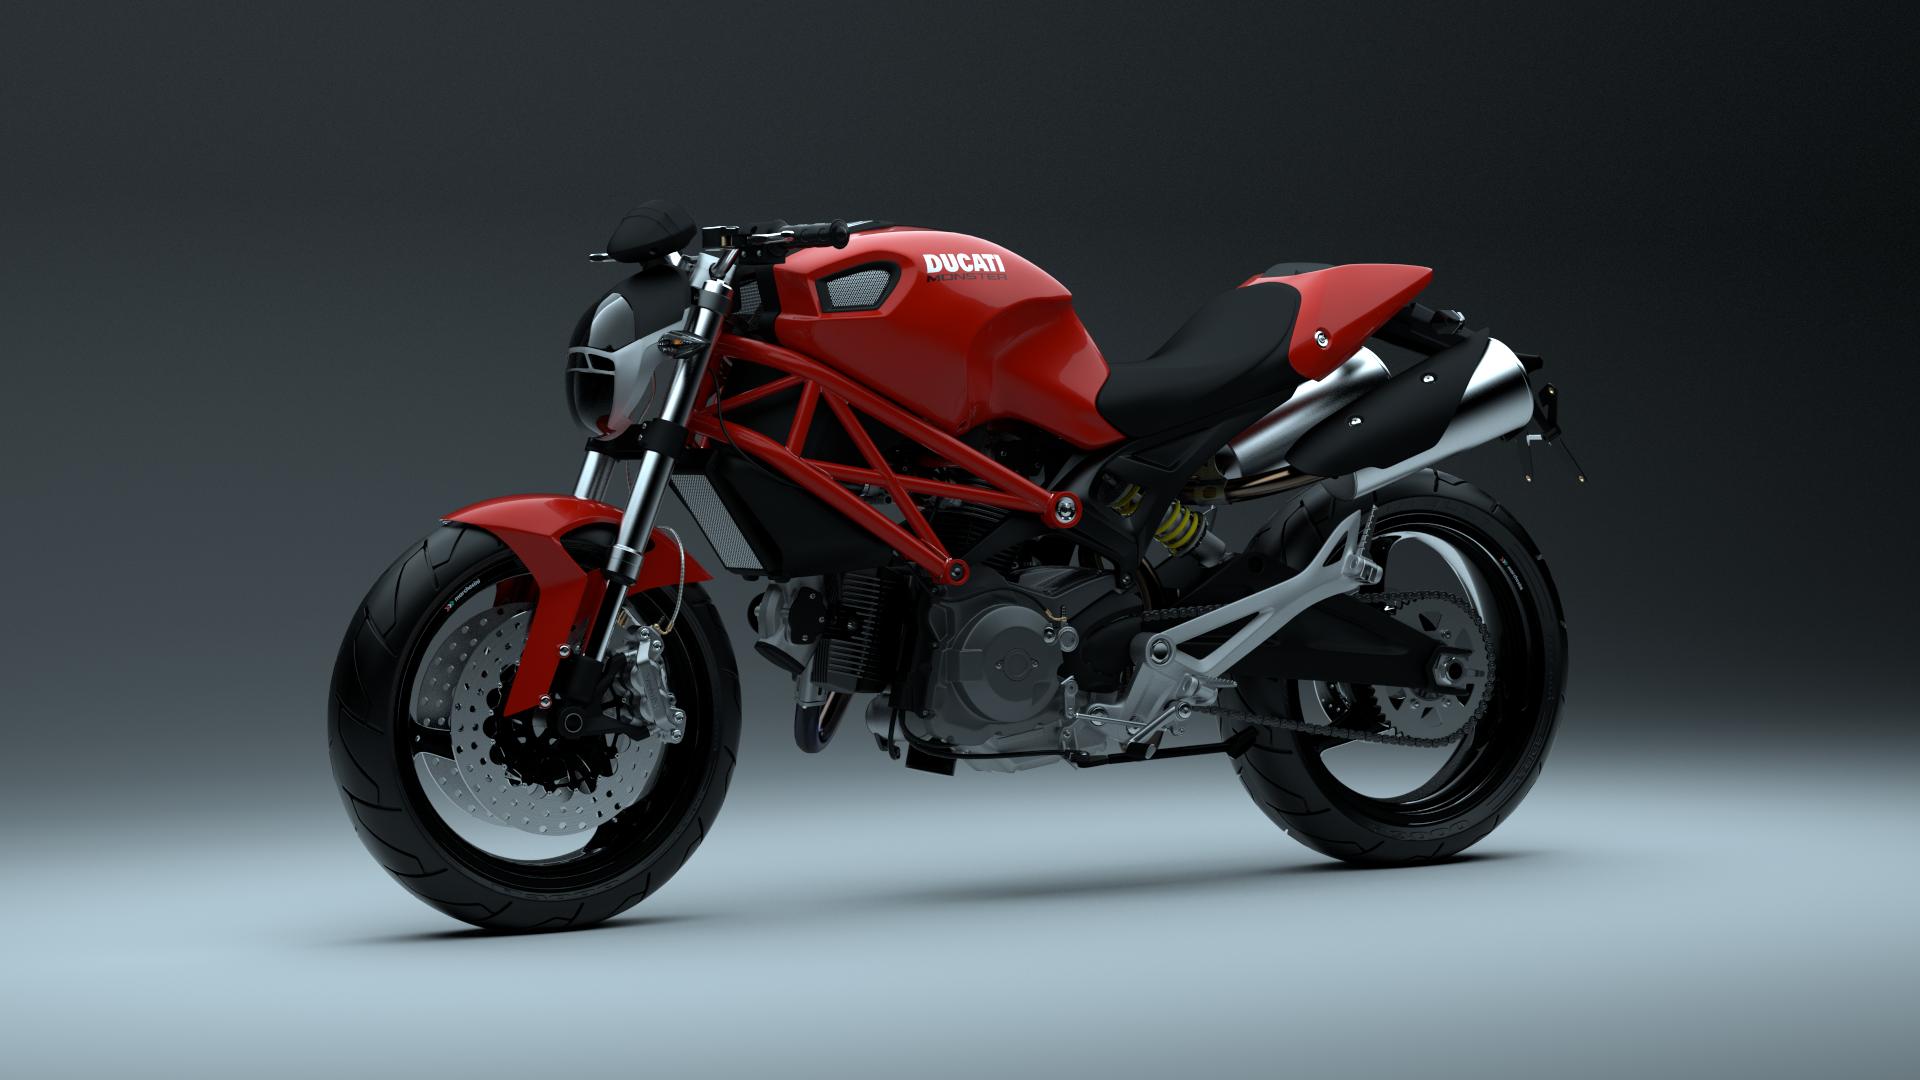 Ducati Monster 696 WIP (textured) by pierre-allard on DeviantArt